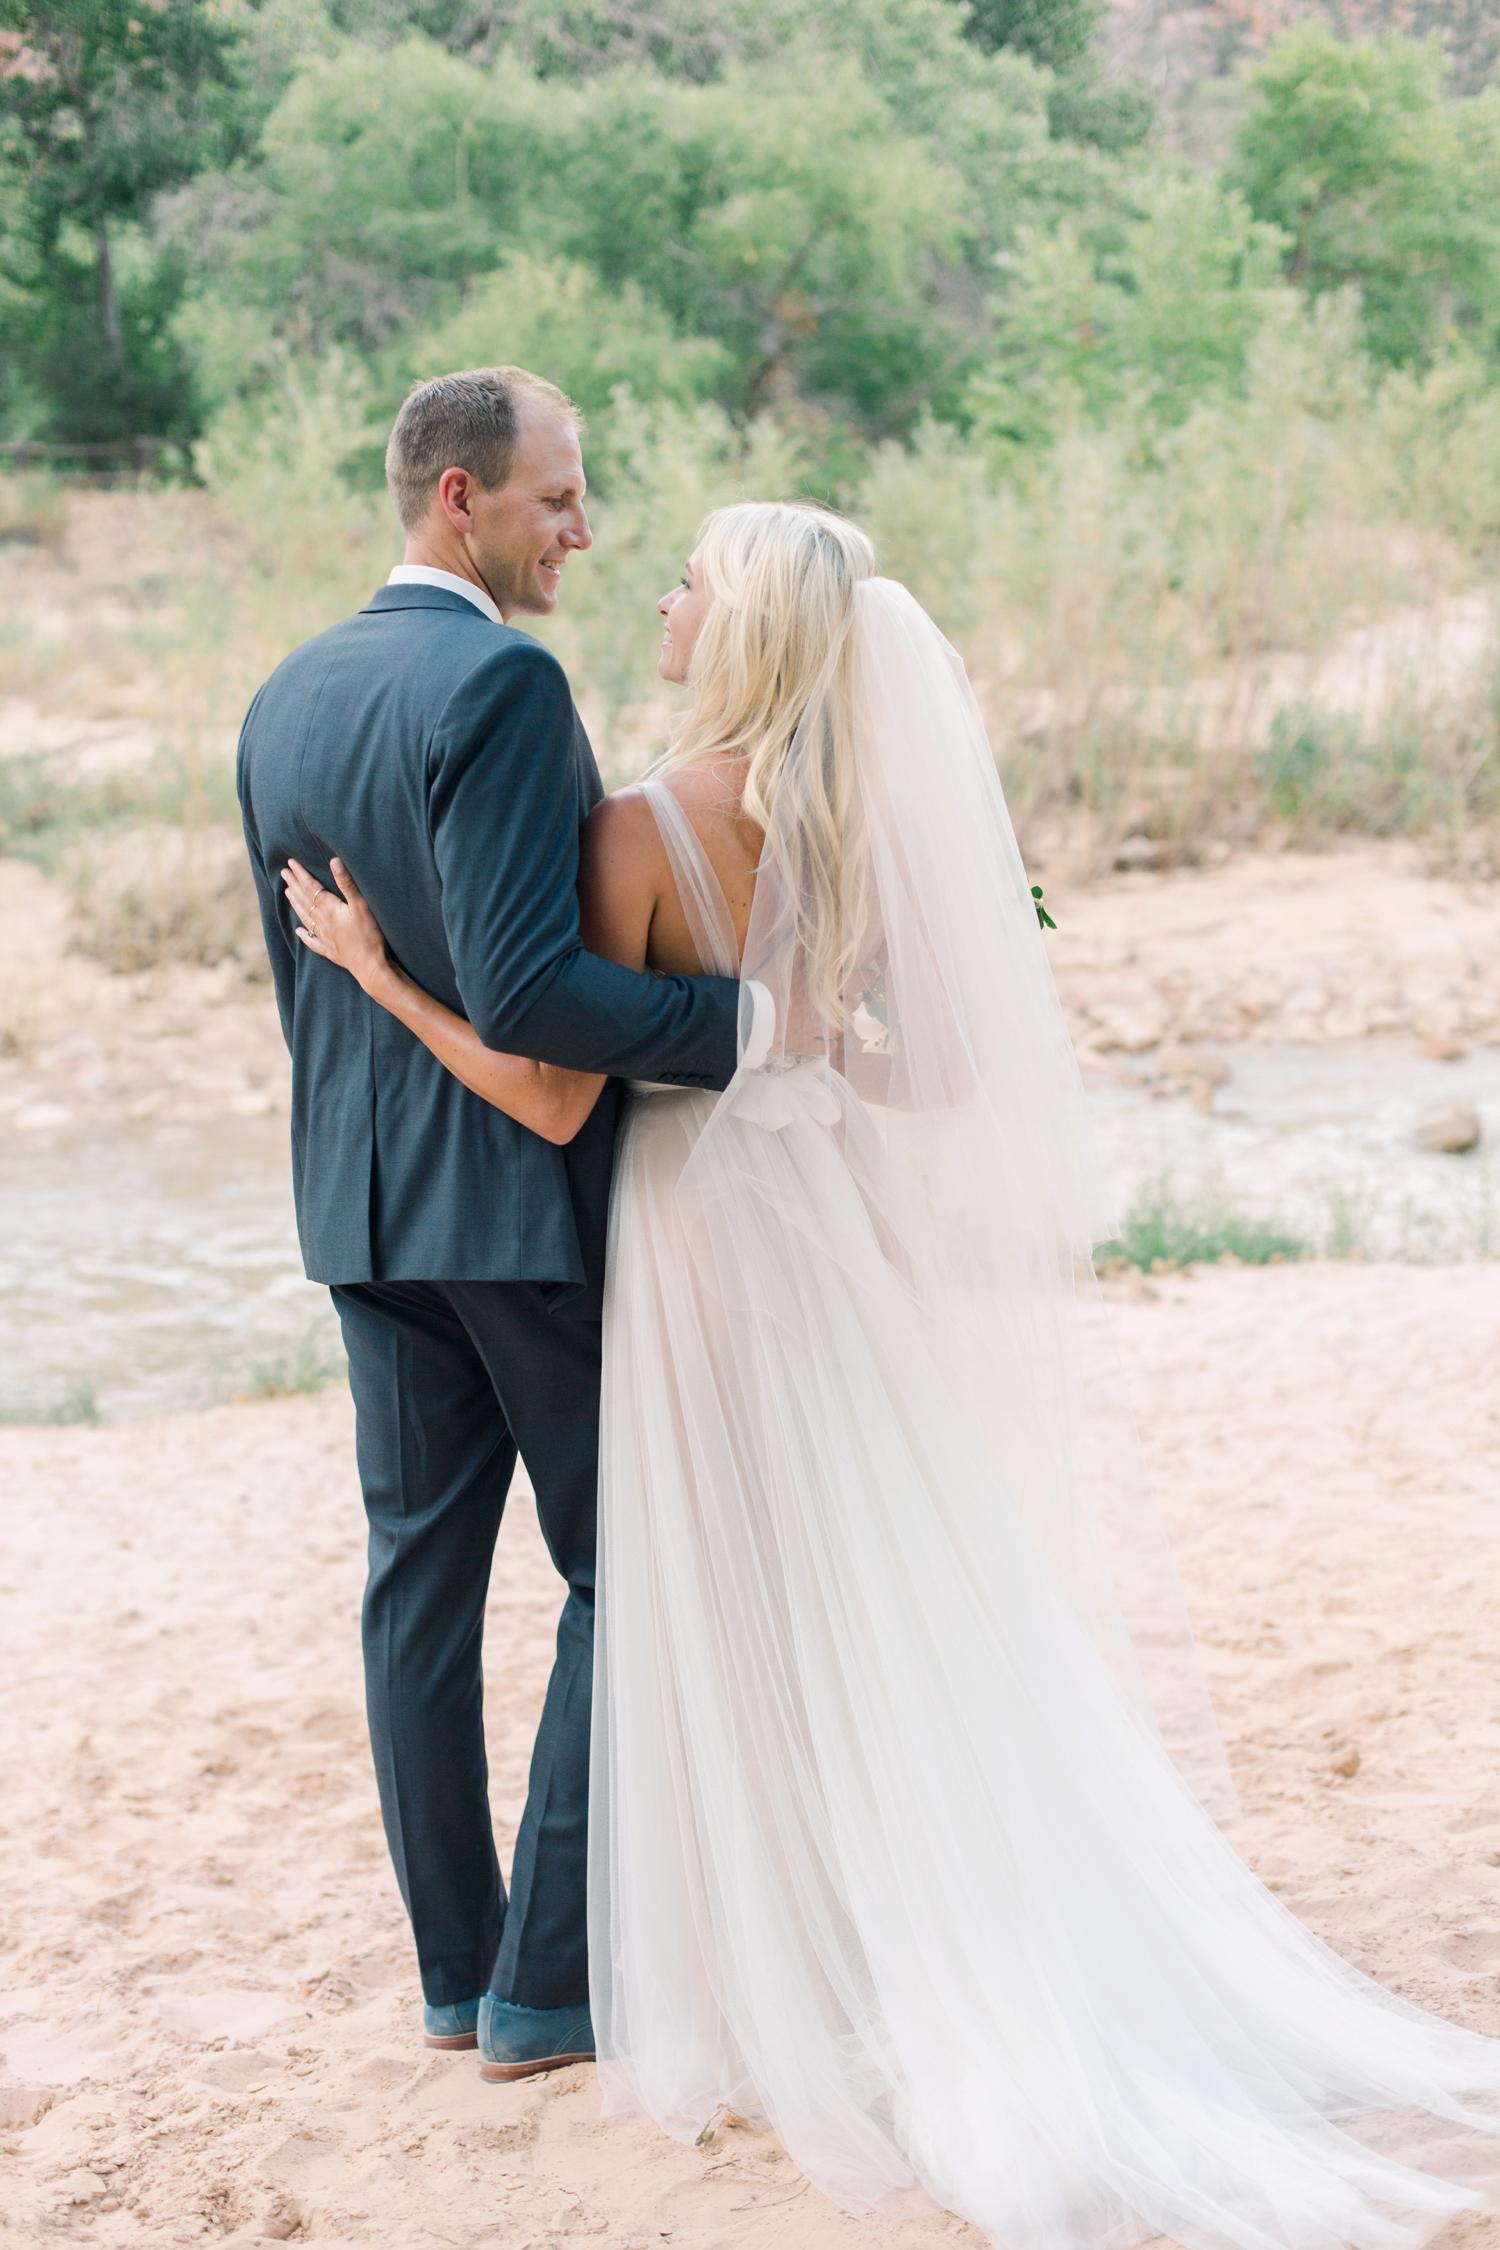 zion-wedding-photography-0023.jpg